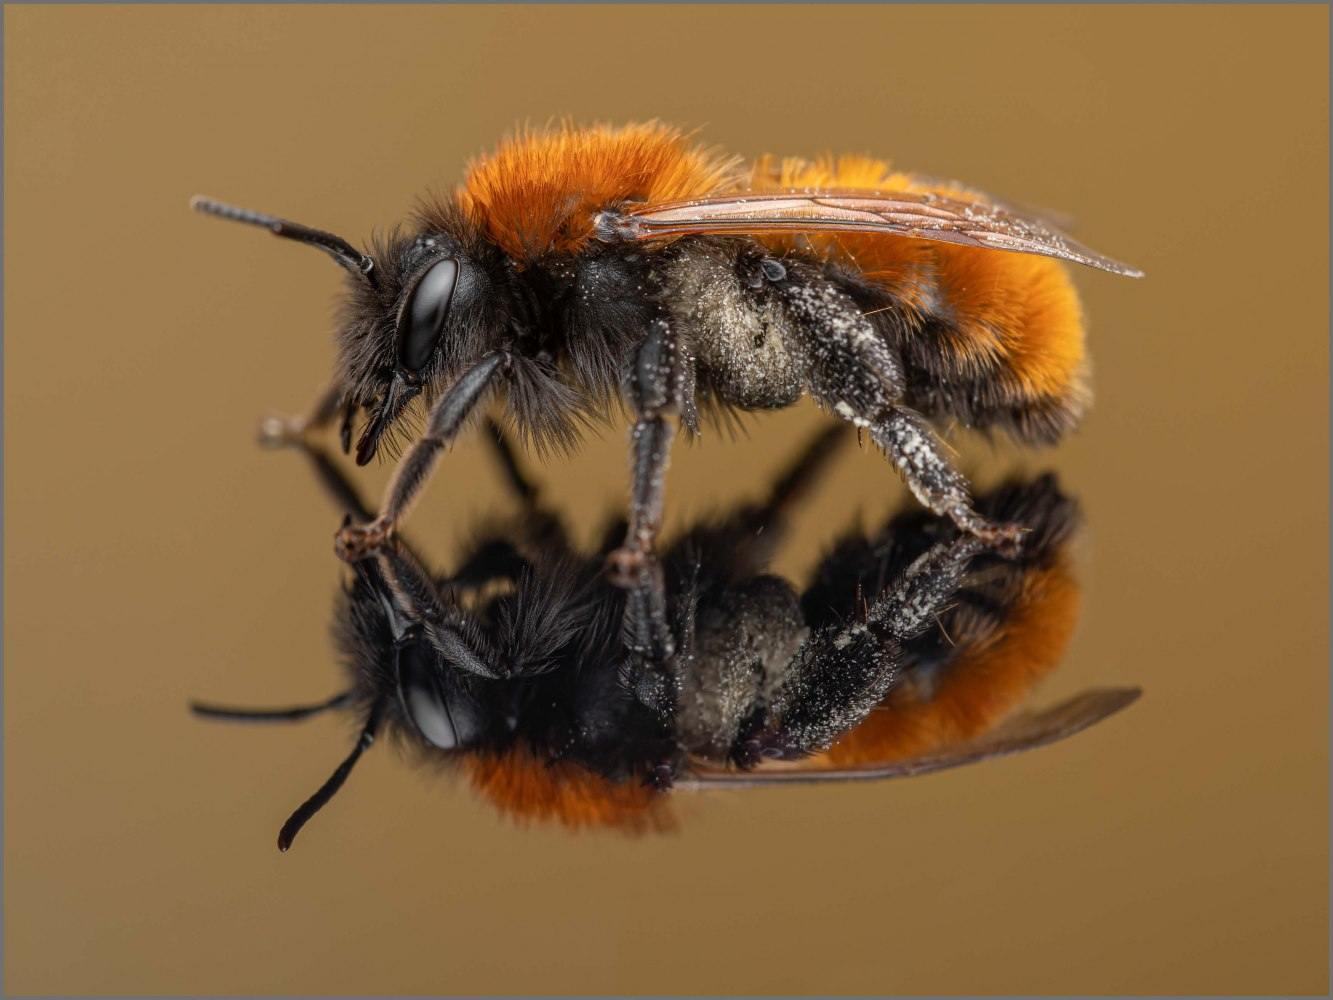 Andrena-fulva-female-Muller-1766-2